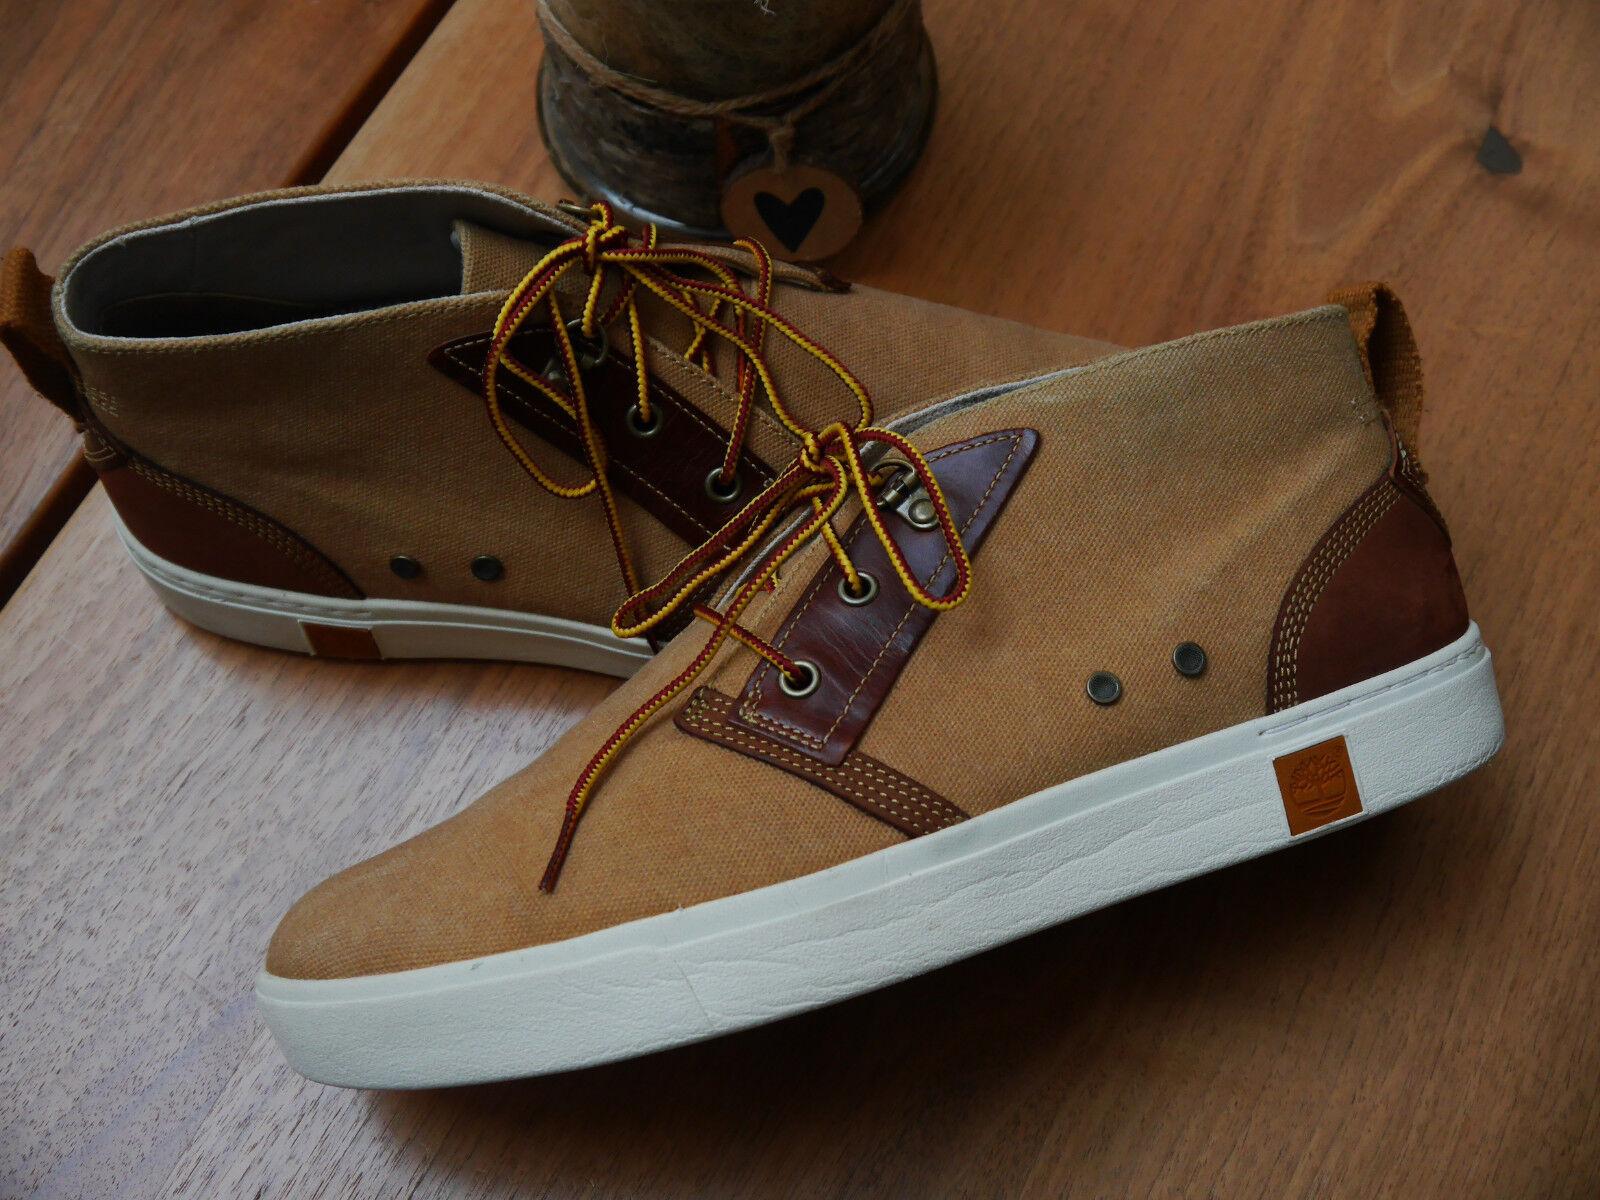 TIMBERLBND Launches ★ Herren Sneaker ★ UK 10,5  EU 45 ★ SENSOR FLEX ★COMFORT ★